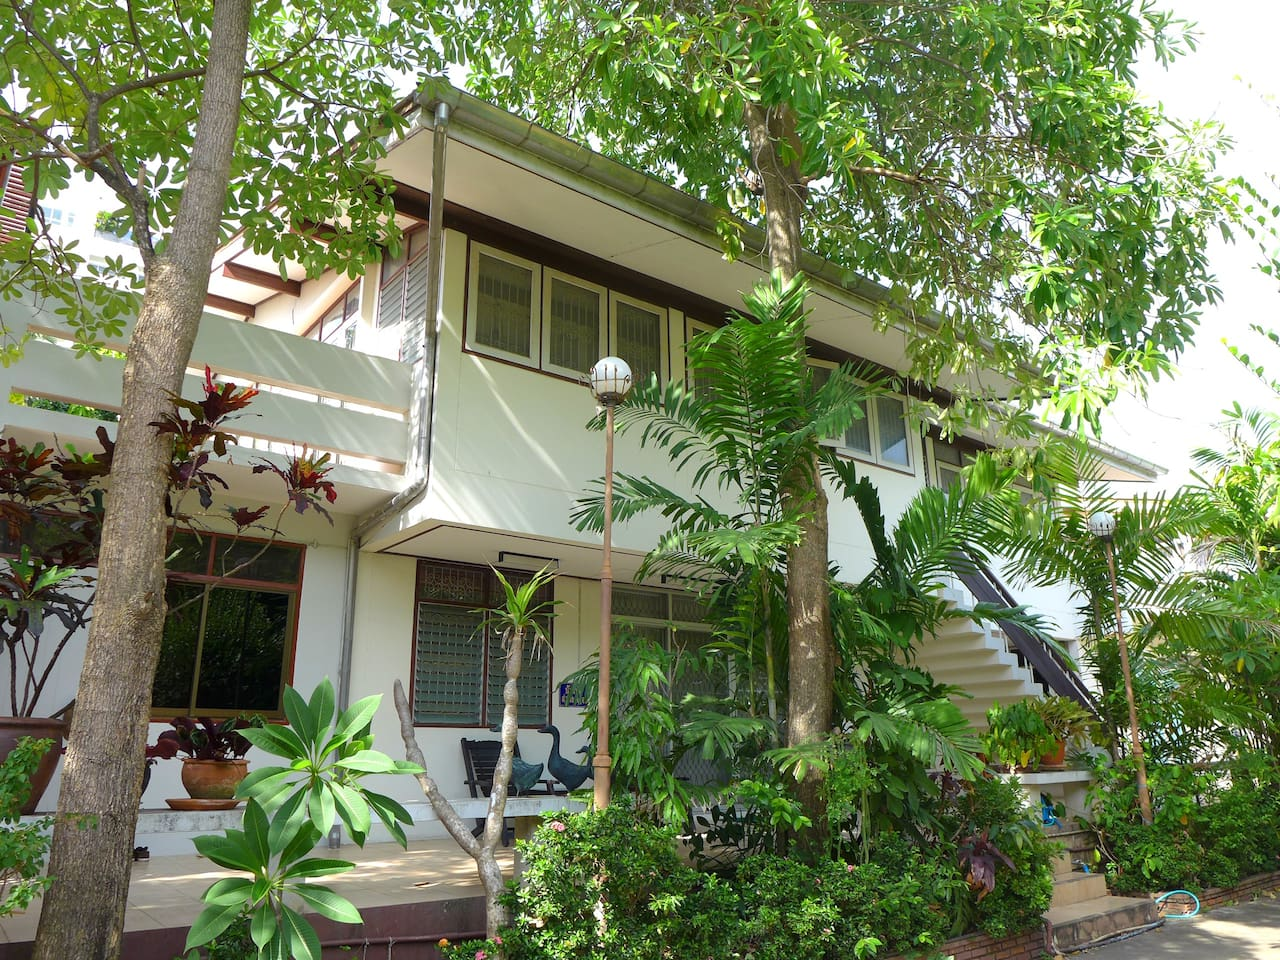 An original Hua Hin beach home nested in a lush garden. Only steps away from the beach.